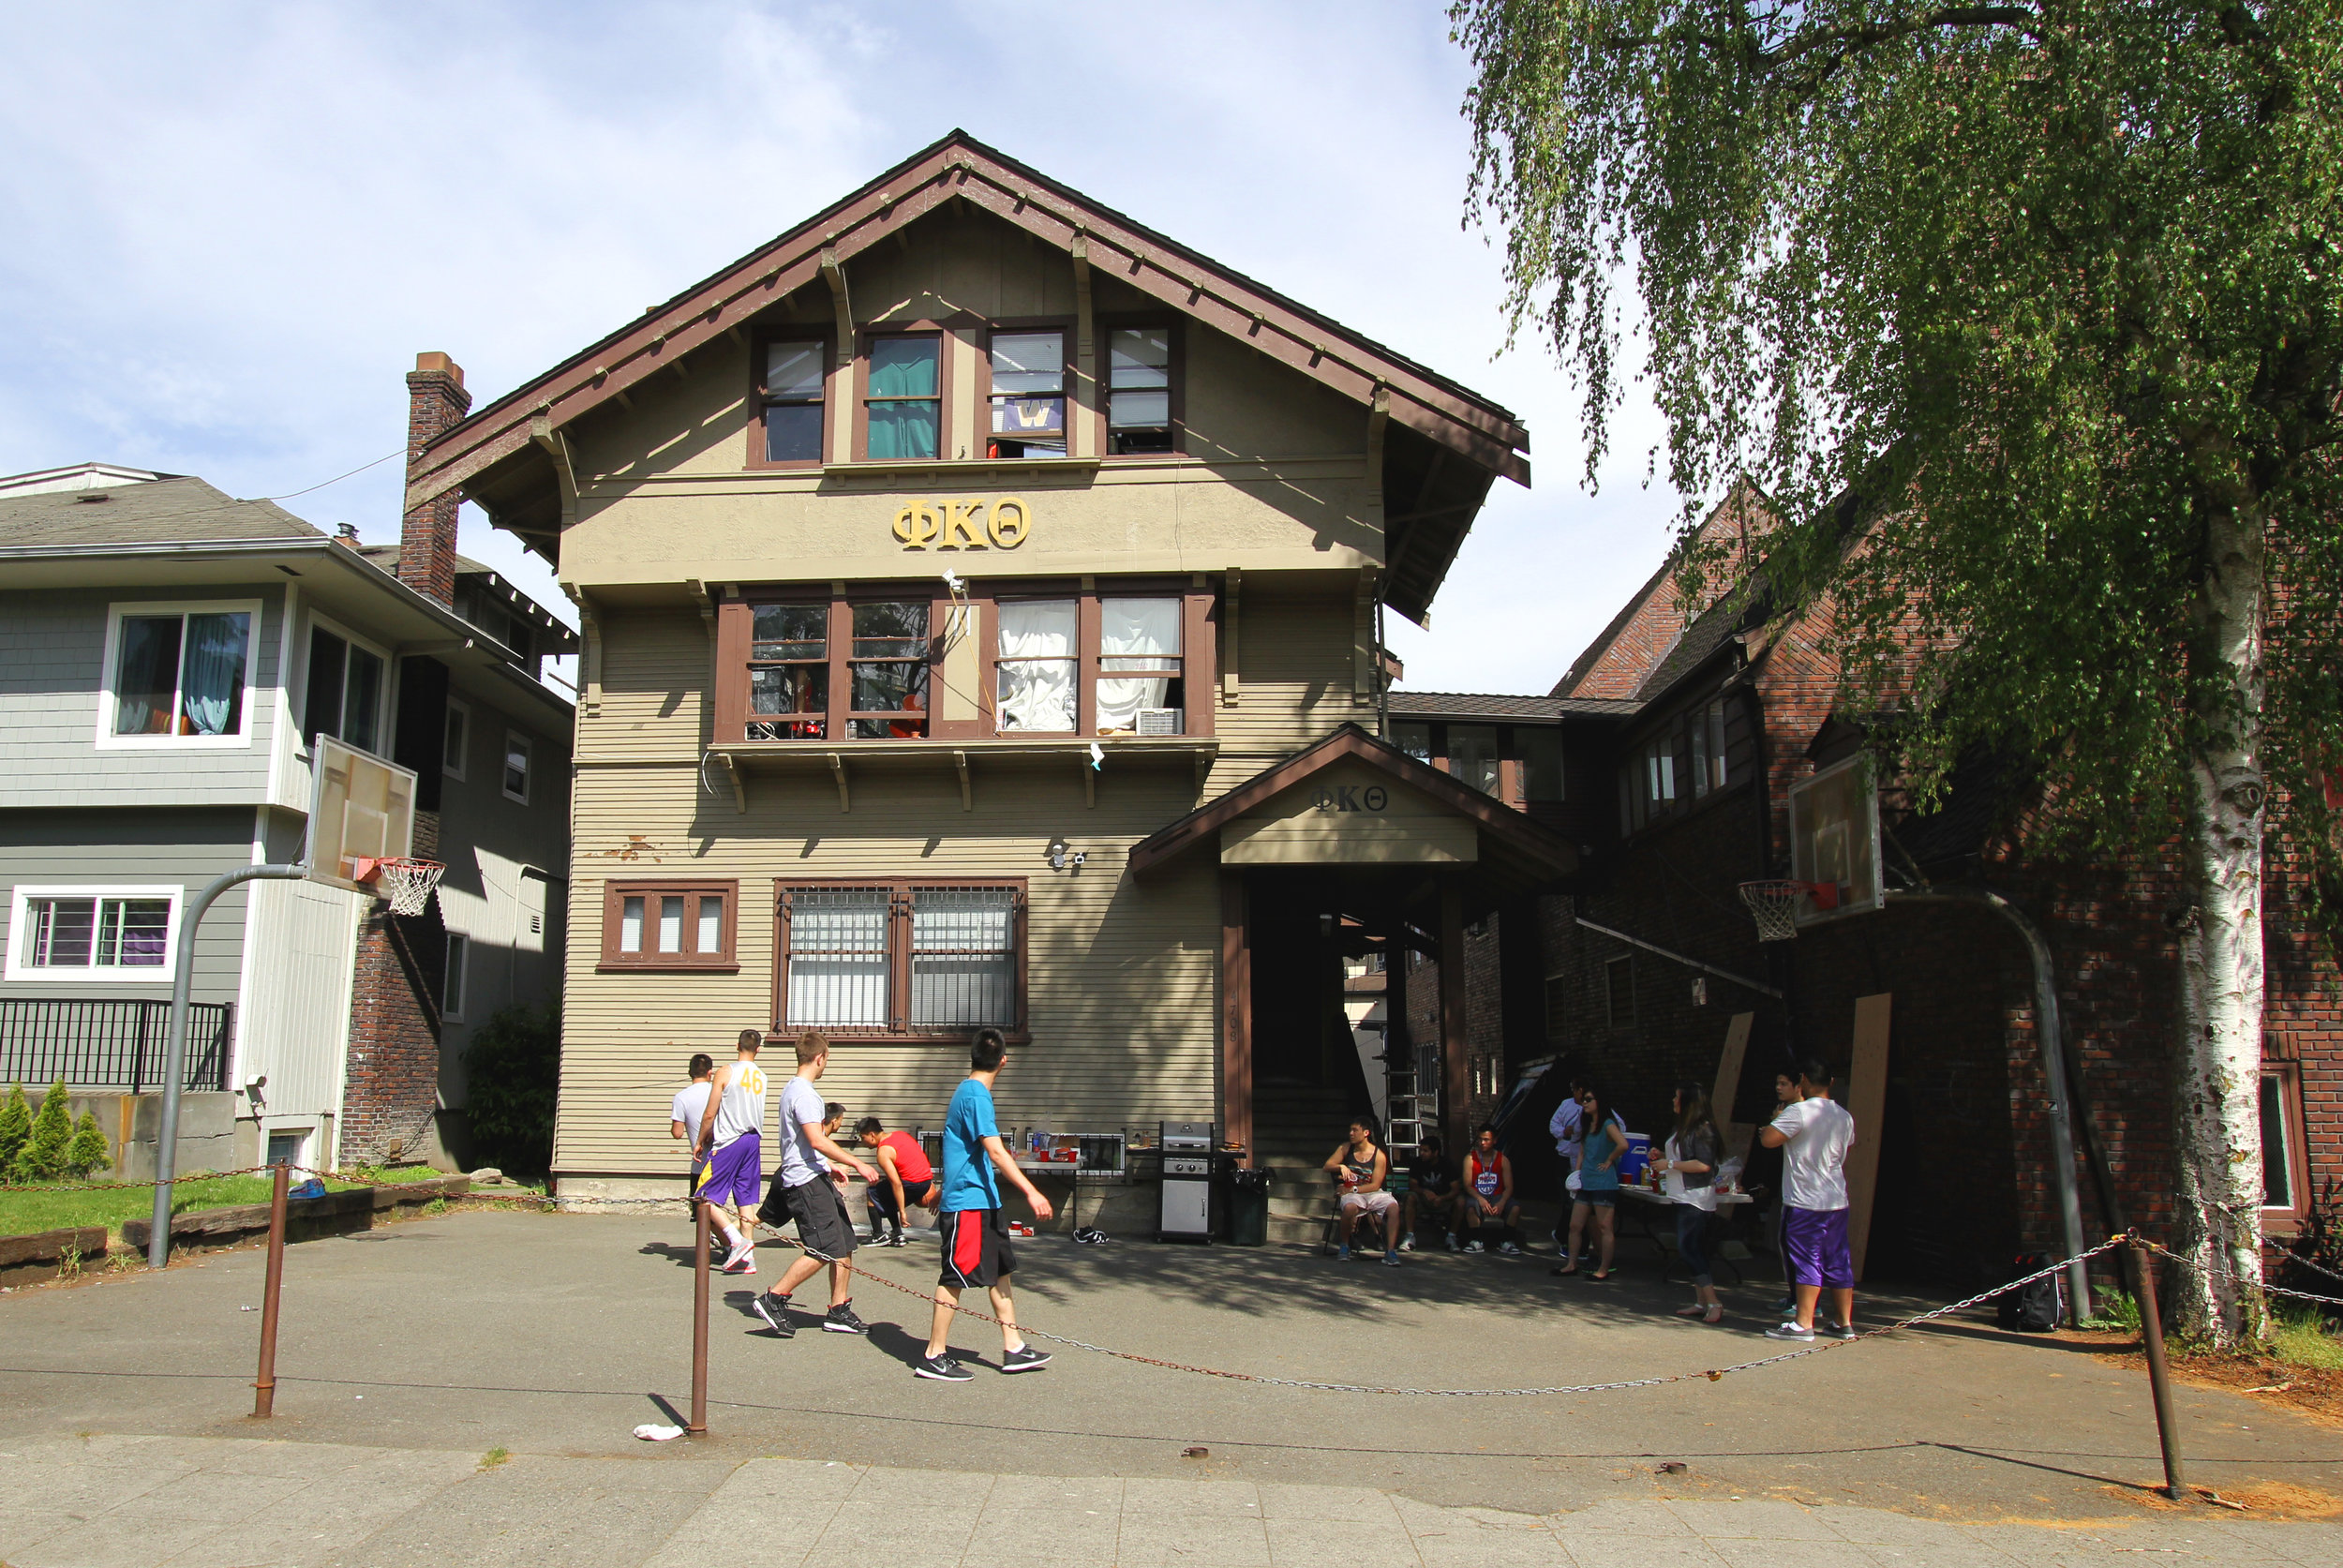 The Phi Kappa Theta fraternity chapter house.